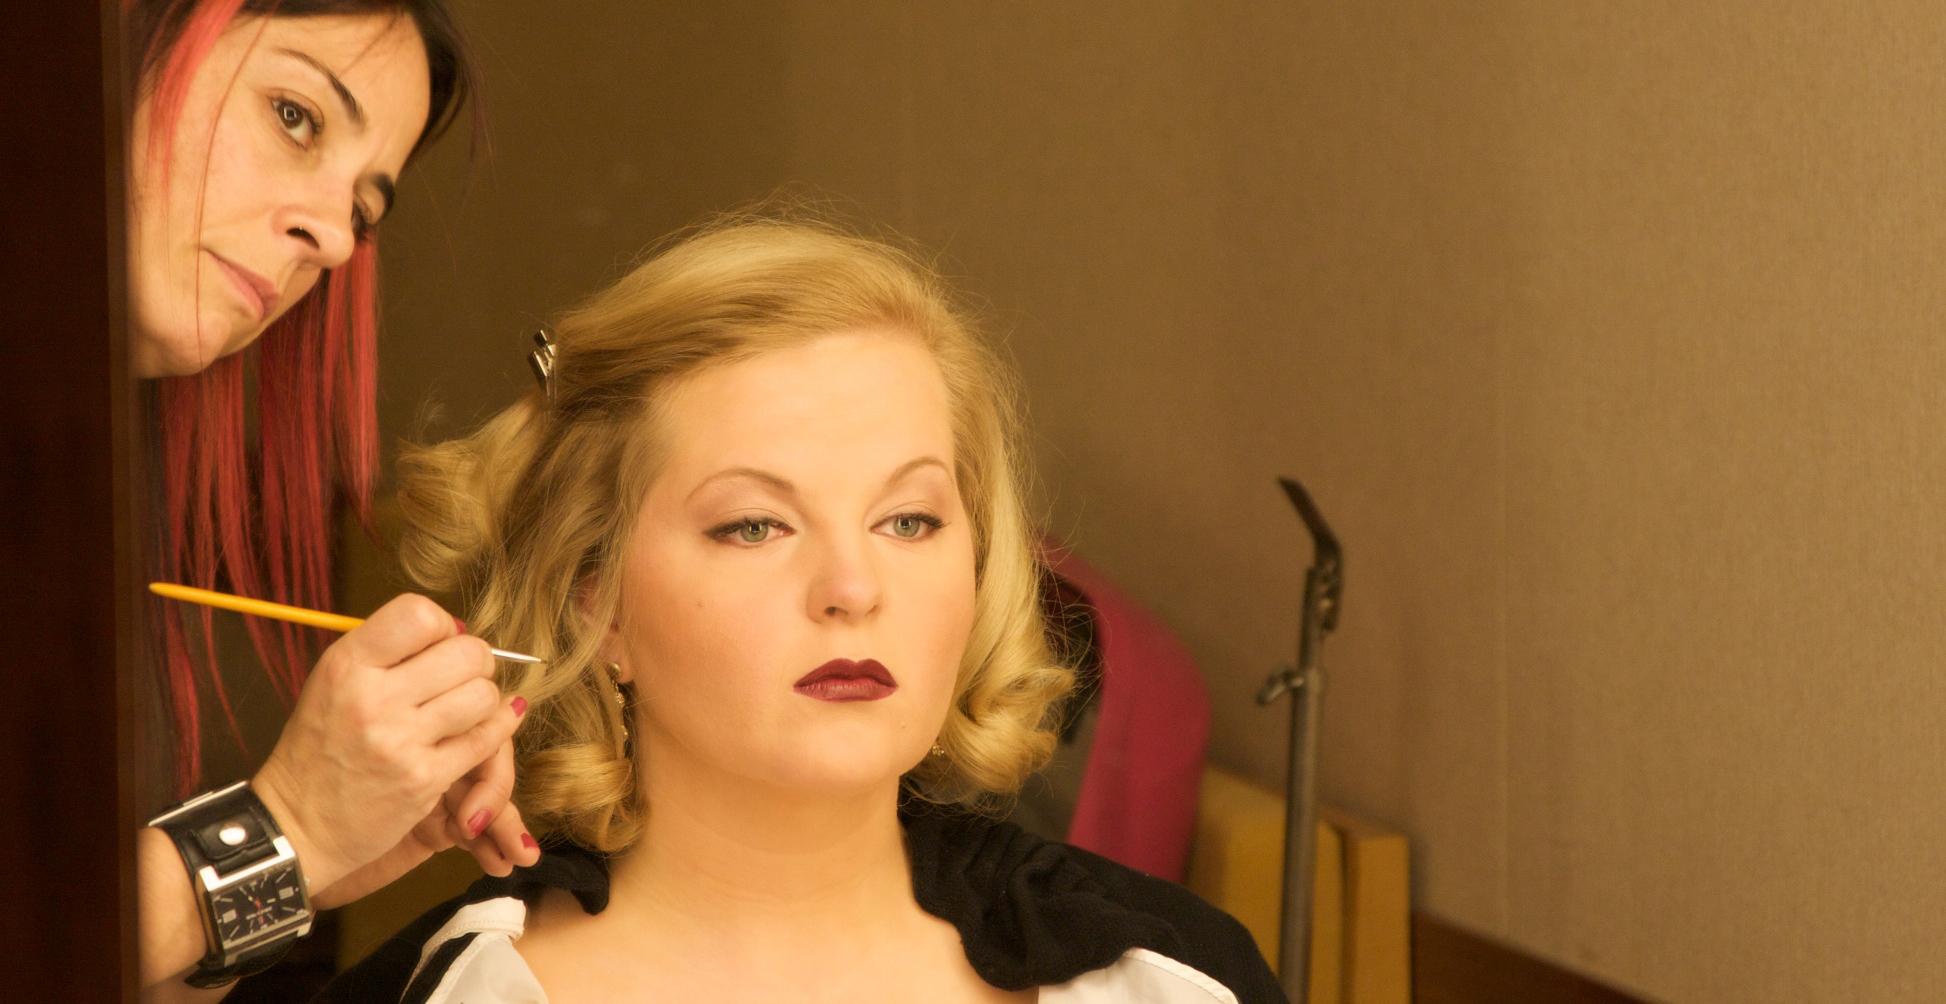 MakeupForMissaSolemnisDVDFilminginLisbon.jpg